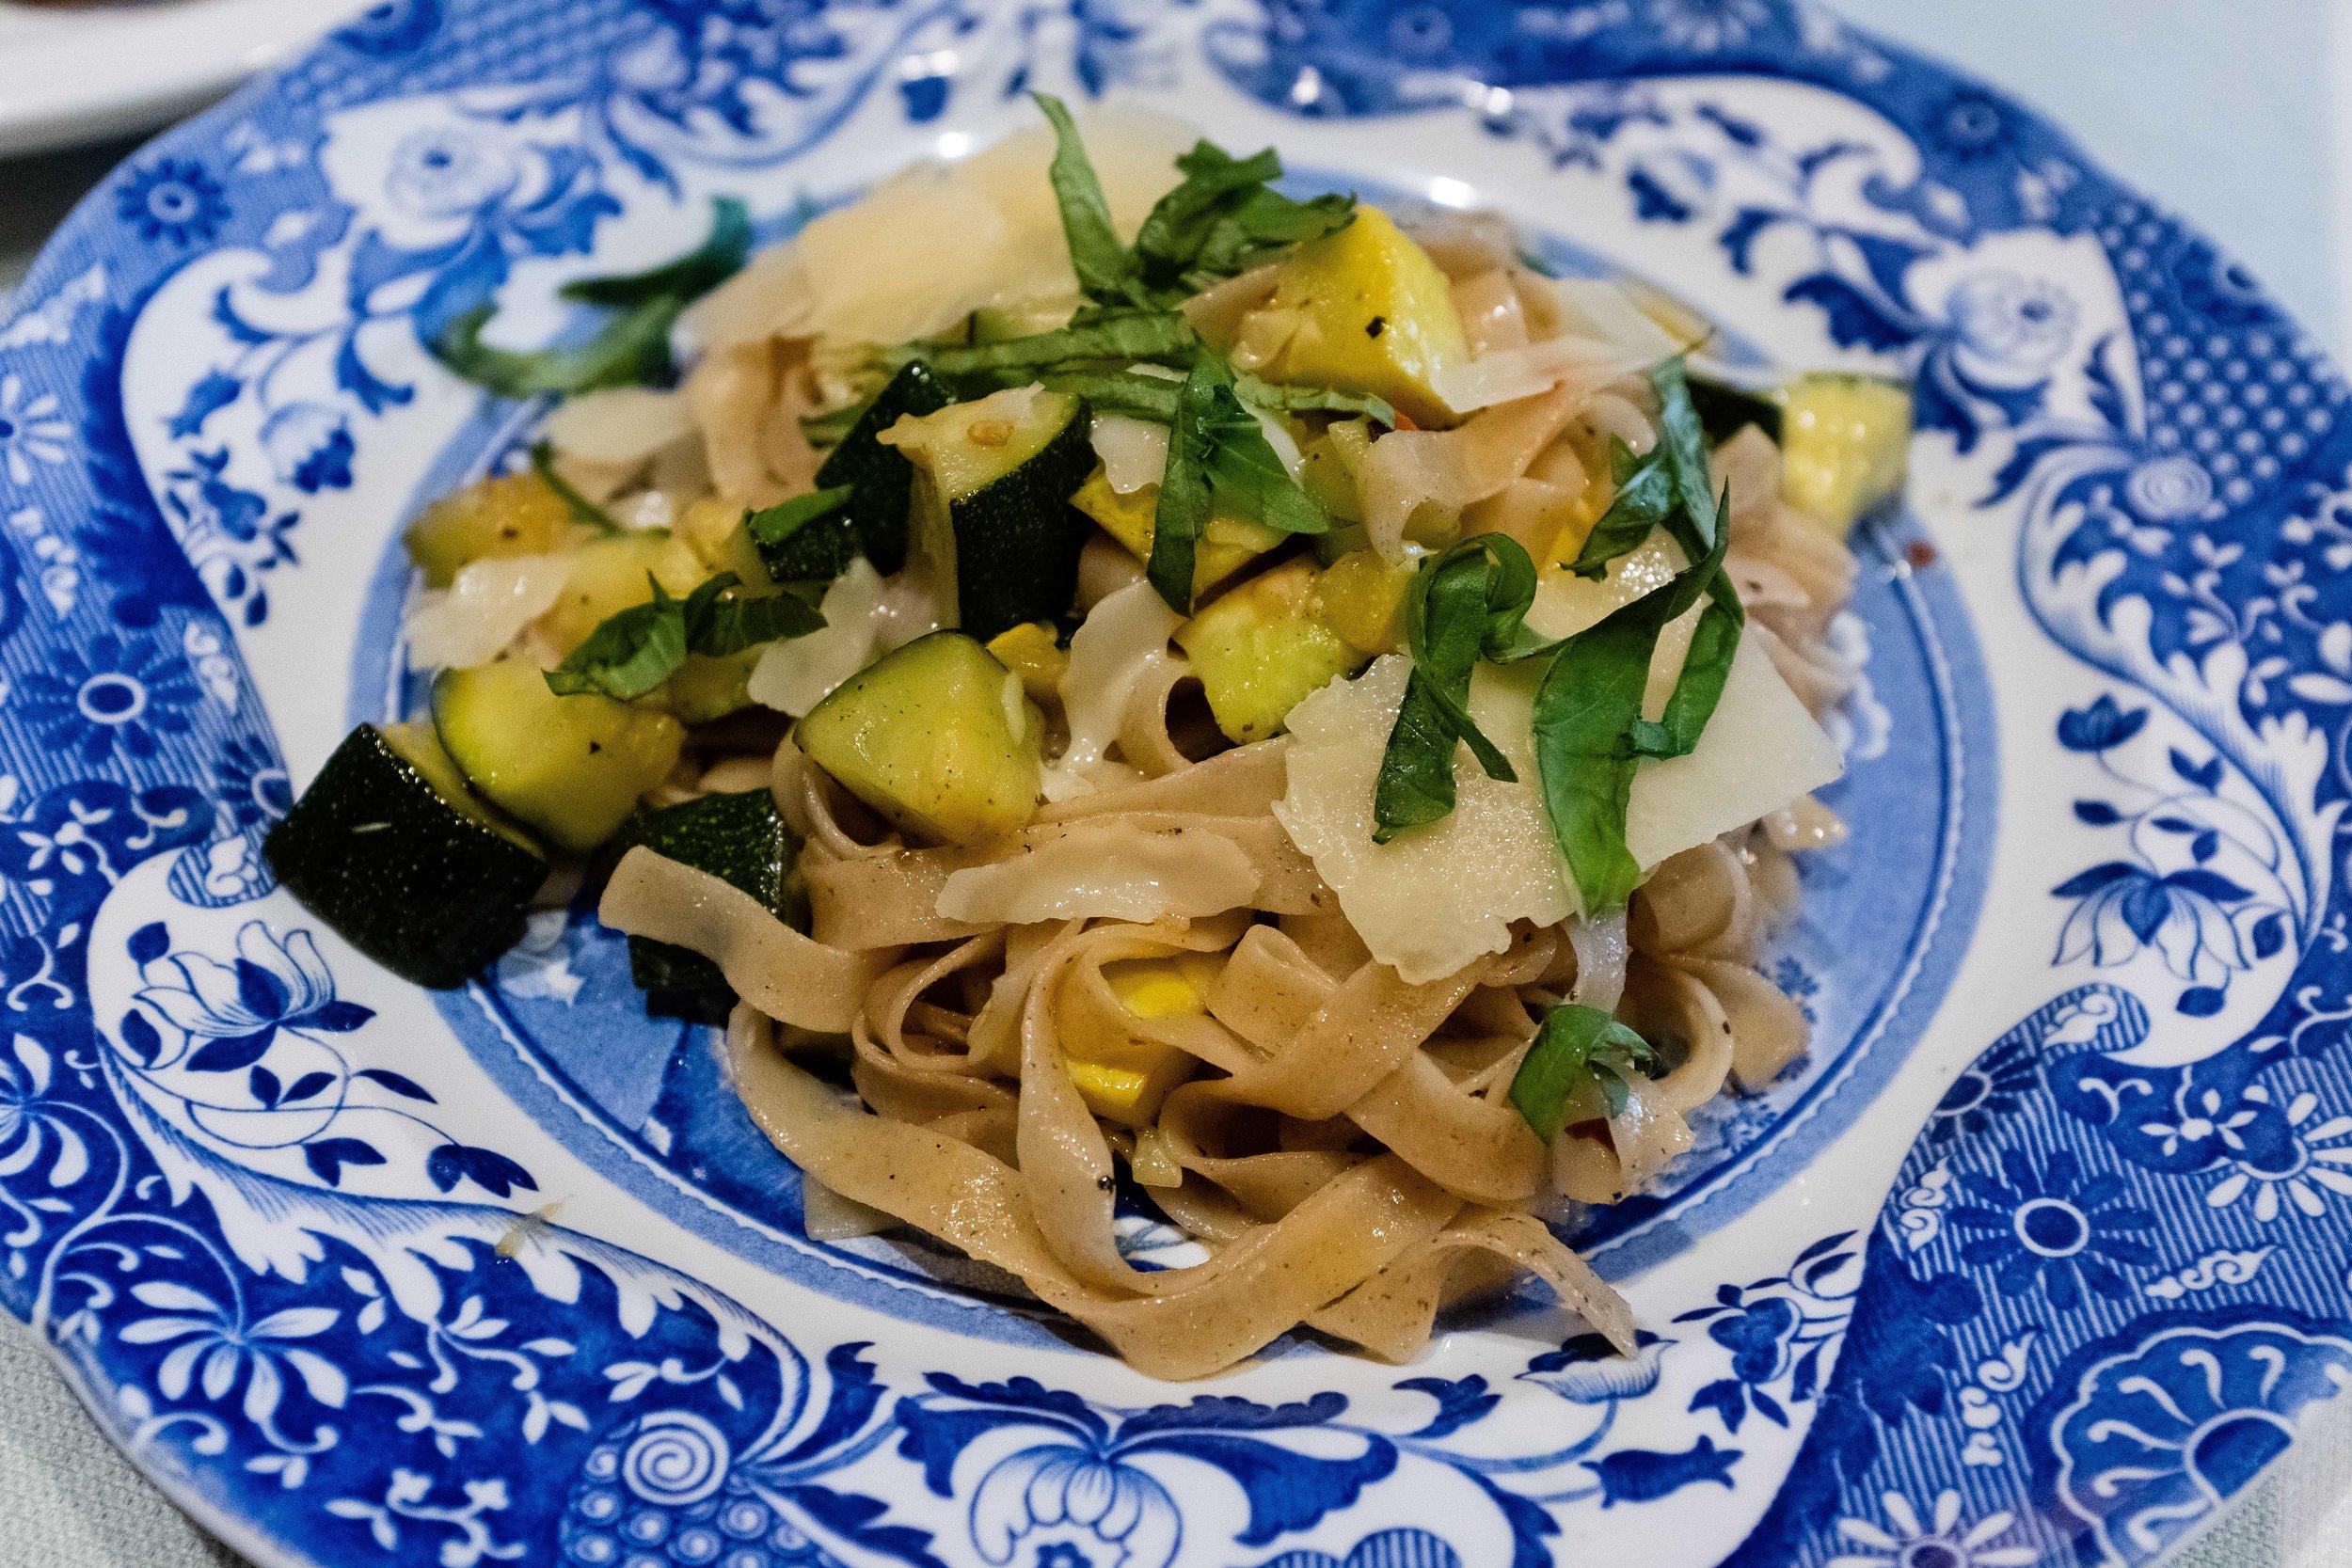 Sonoran Pasta Company of Phoenix linguine with vegtables. Joseph Berg Lifestyle Photography.